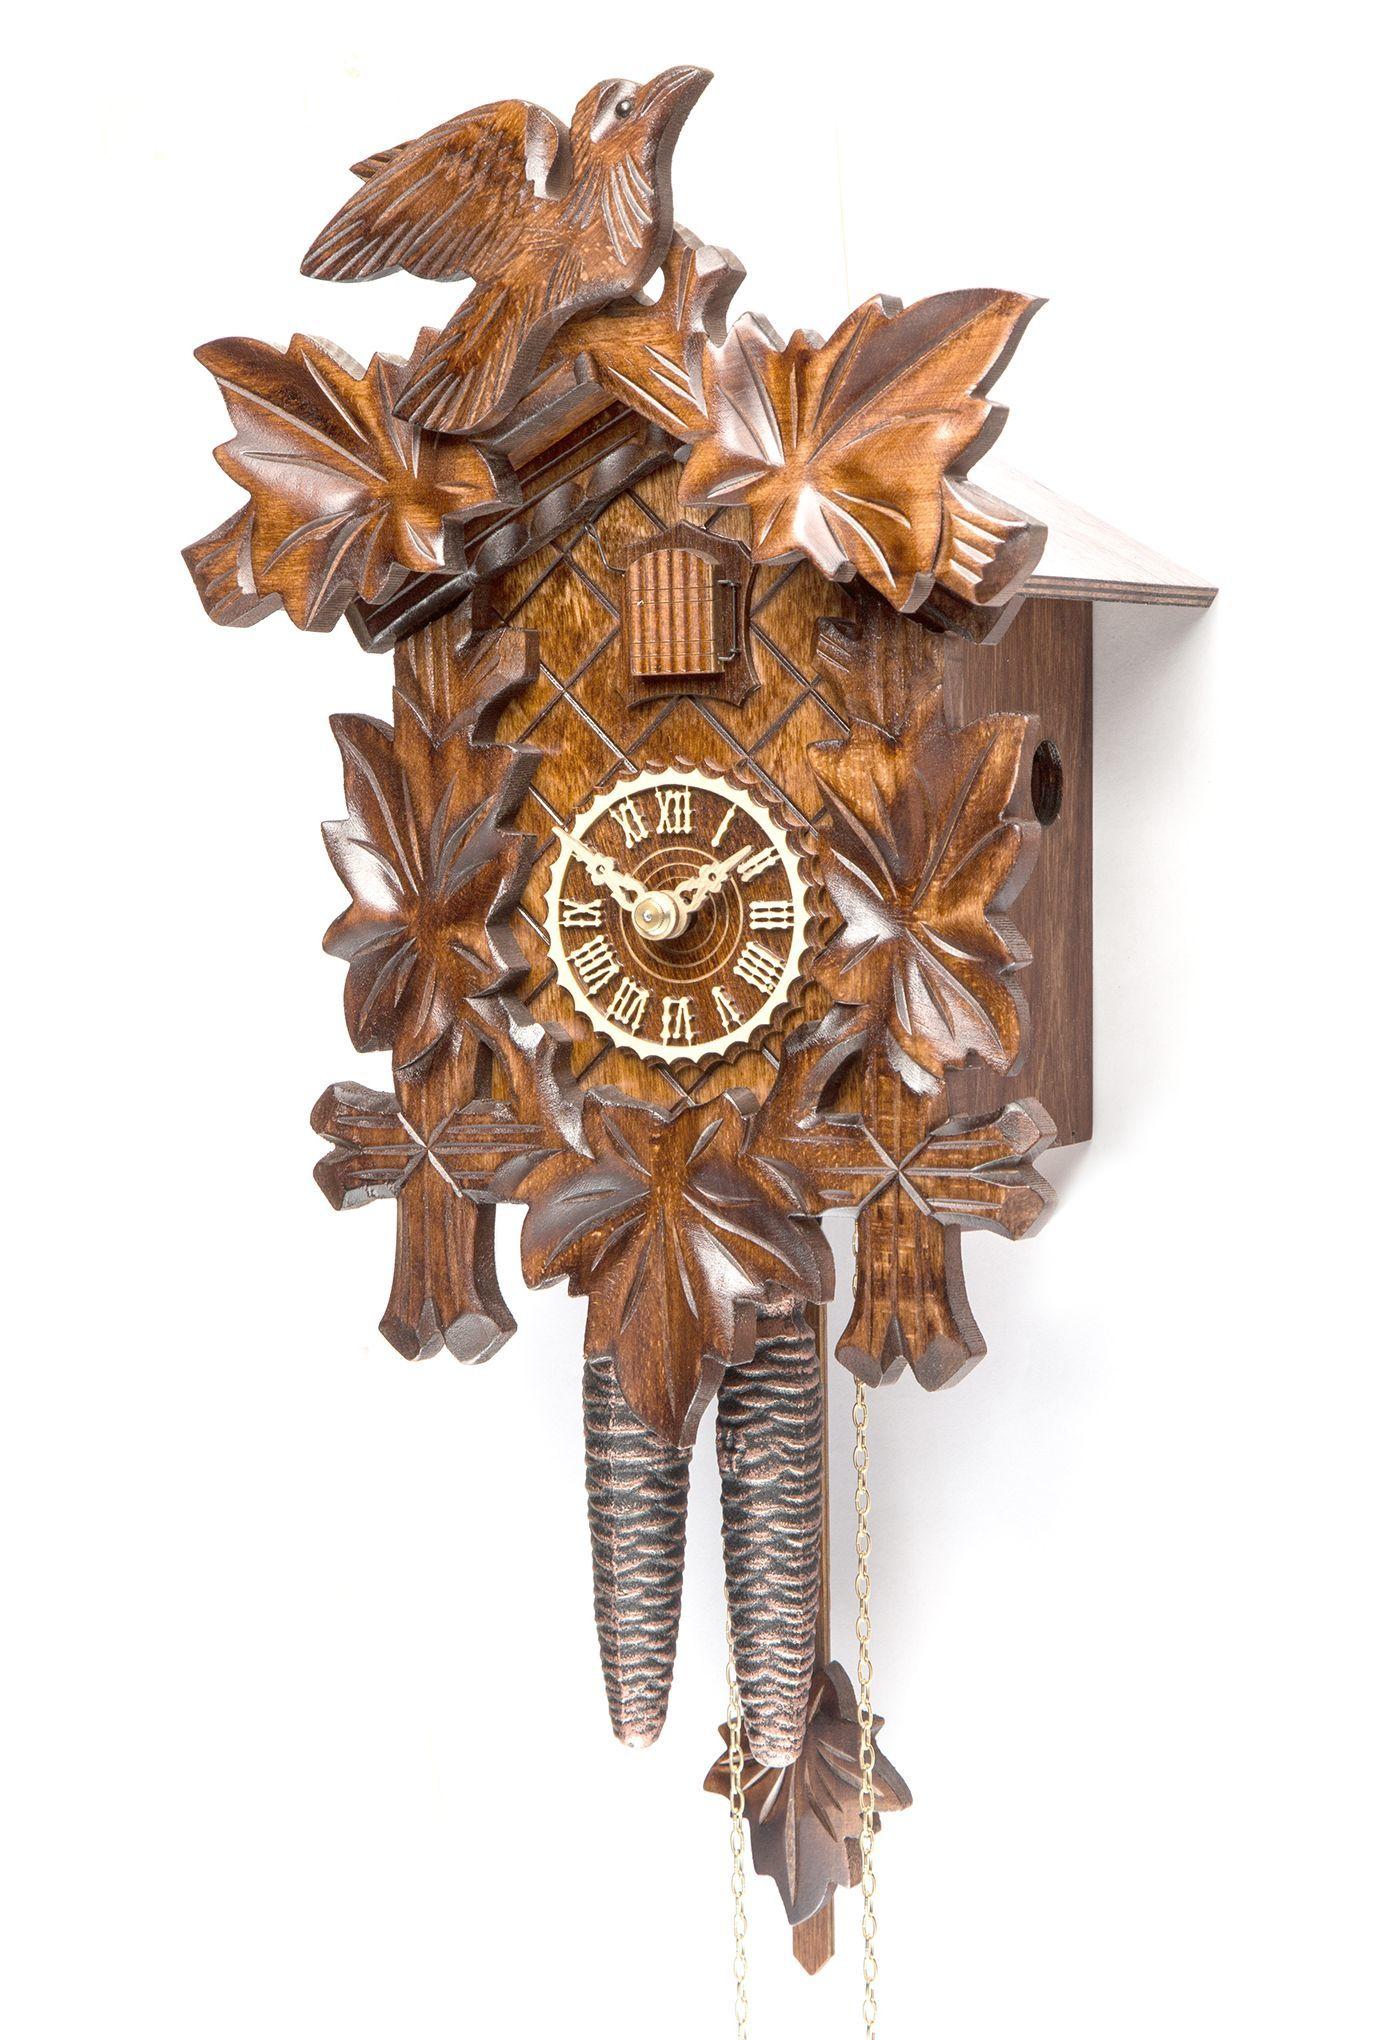 Часы настенные Часы настенные с кукушкой Tomas Stern 5006 chasy-nastennye-s-kukushkoy-tomas-stern-5006-germaniya.jpg